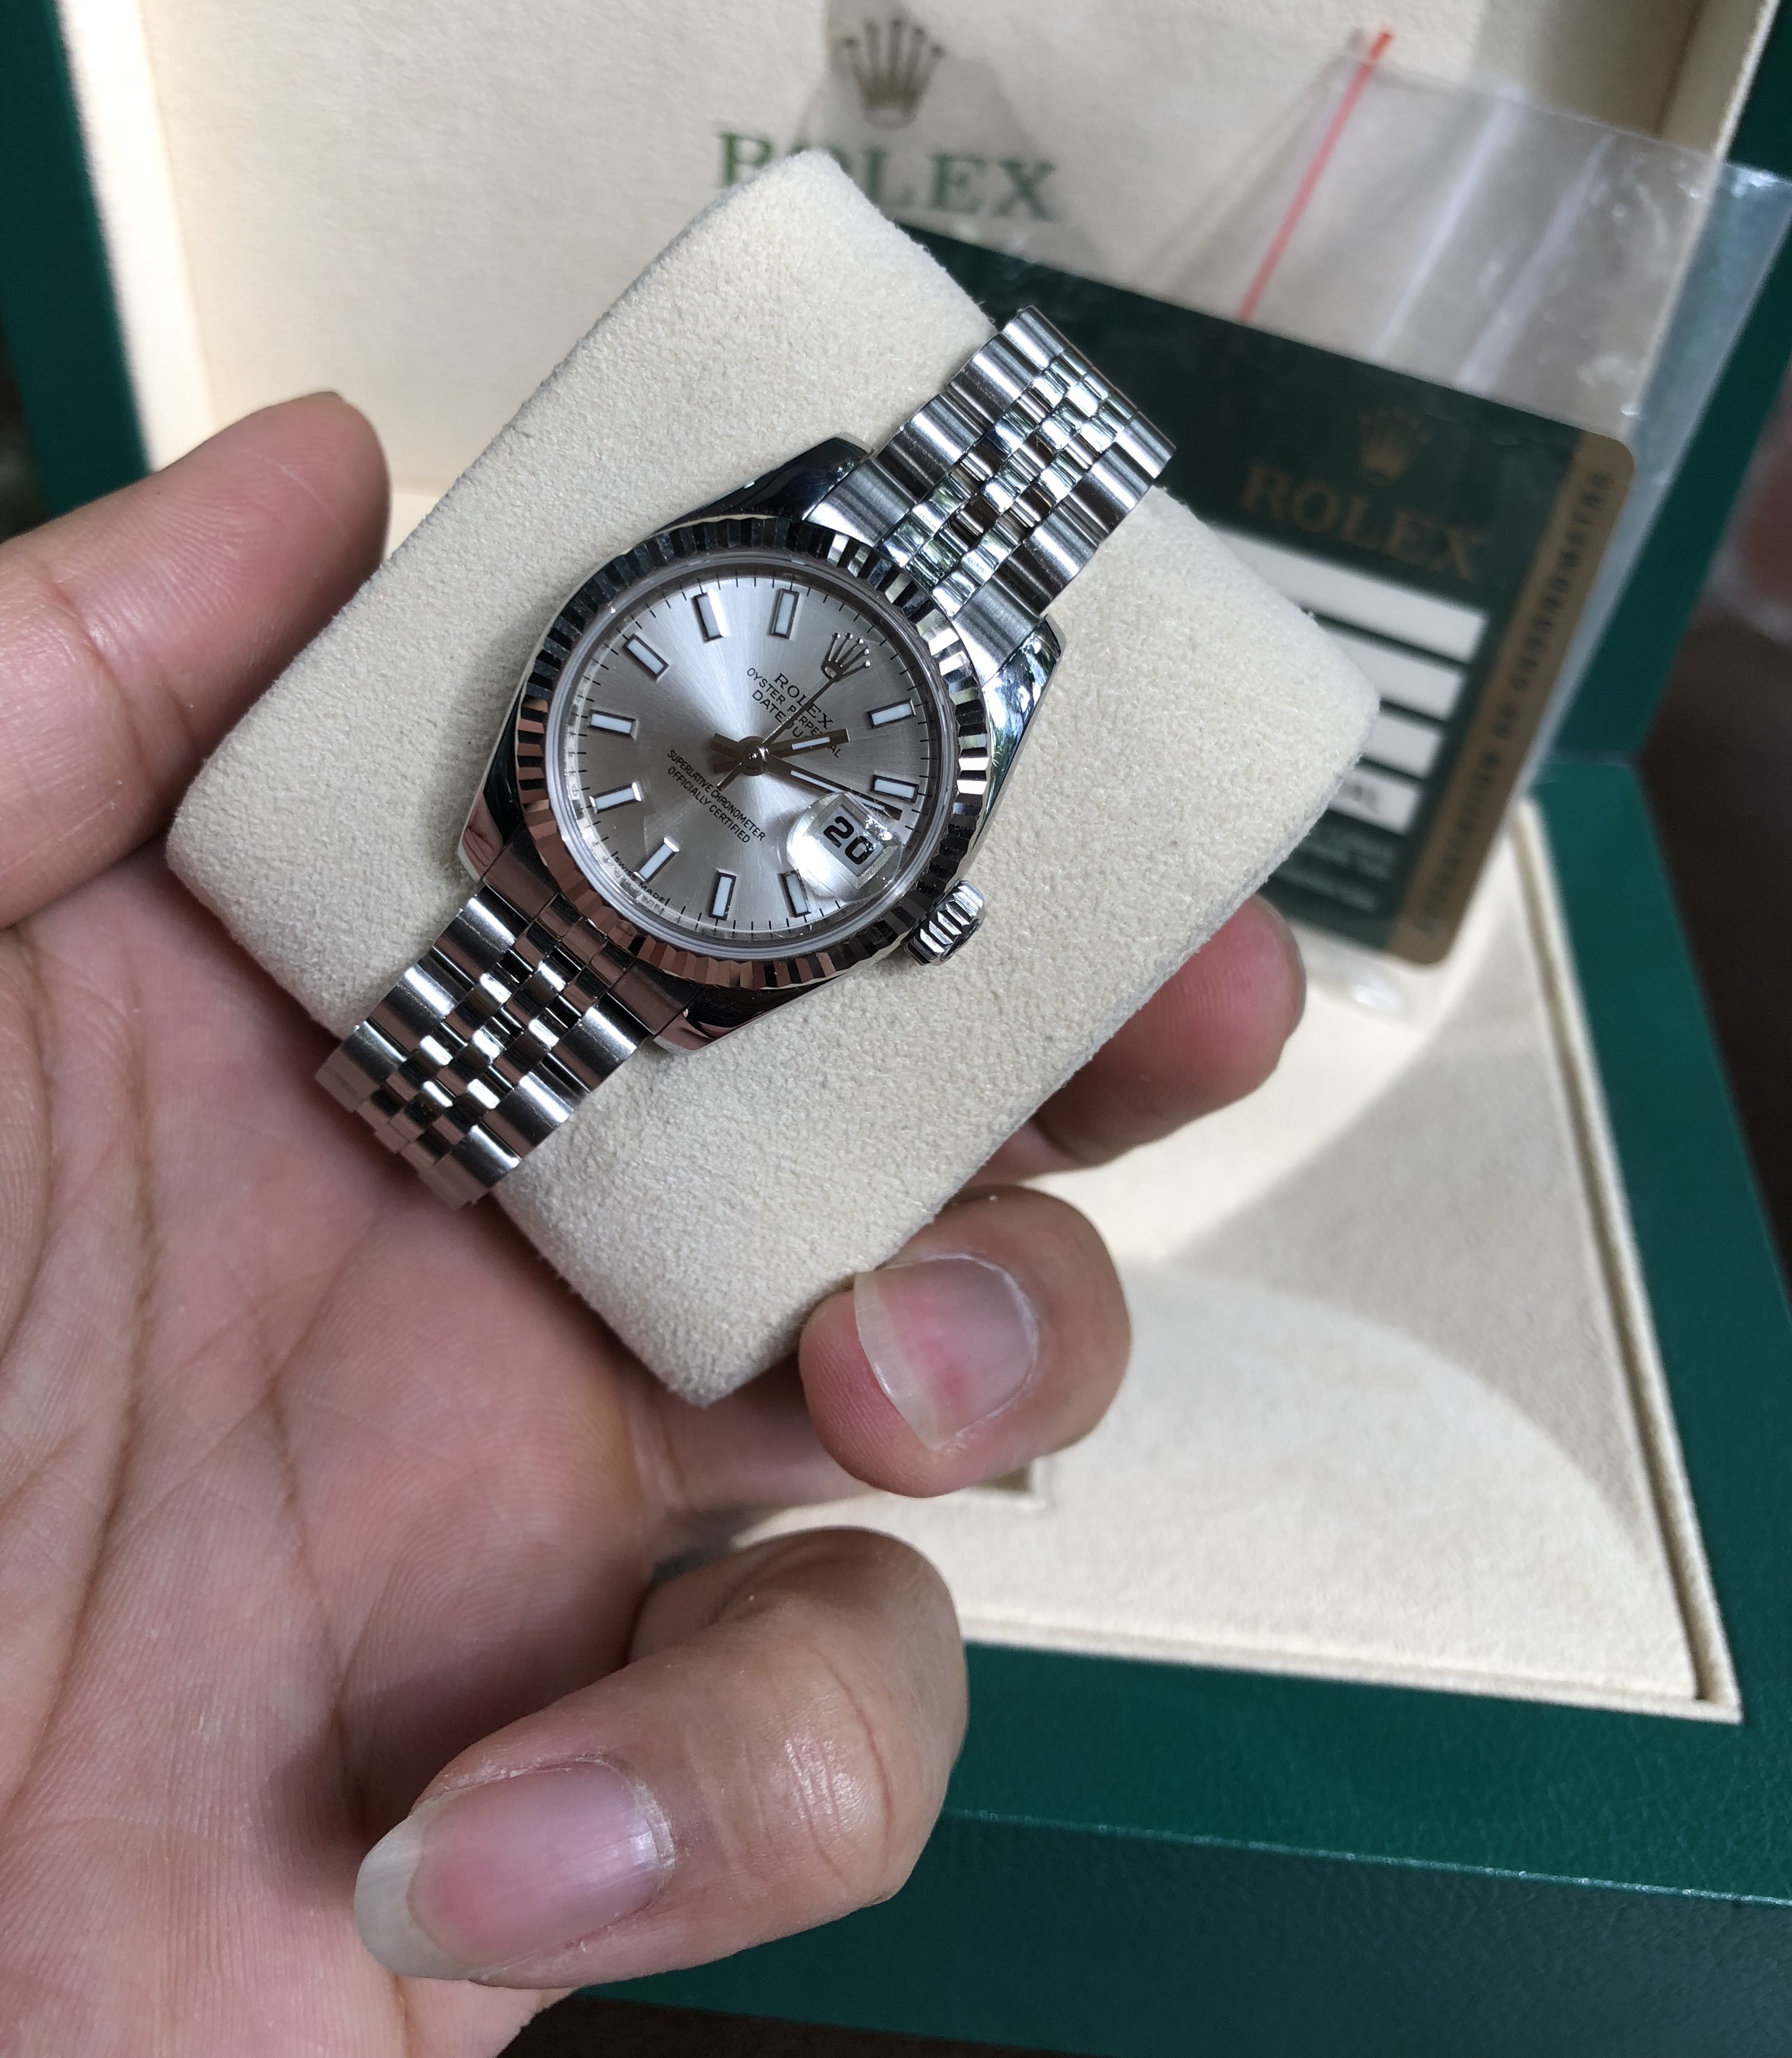 Rolex 179174 mặt trắng tia sản xuất năm 2011 fullbox